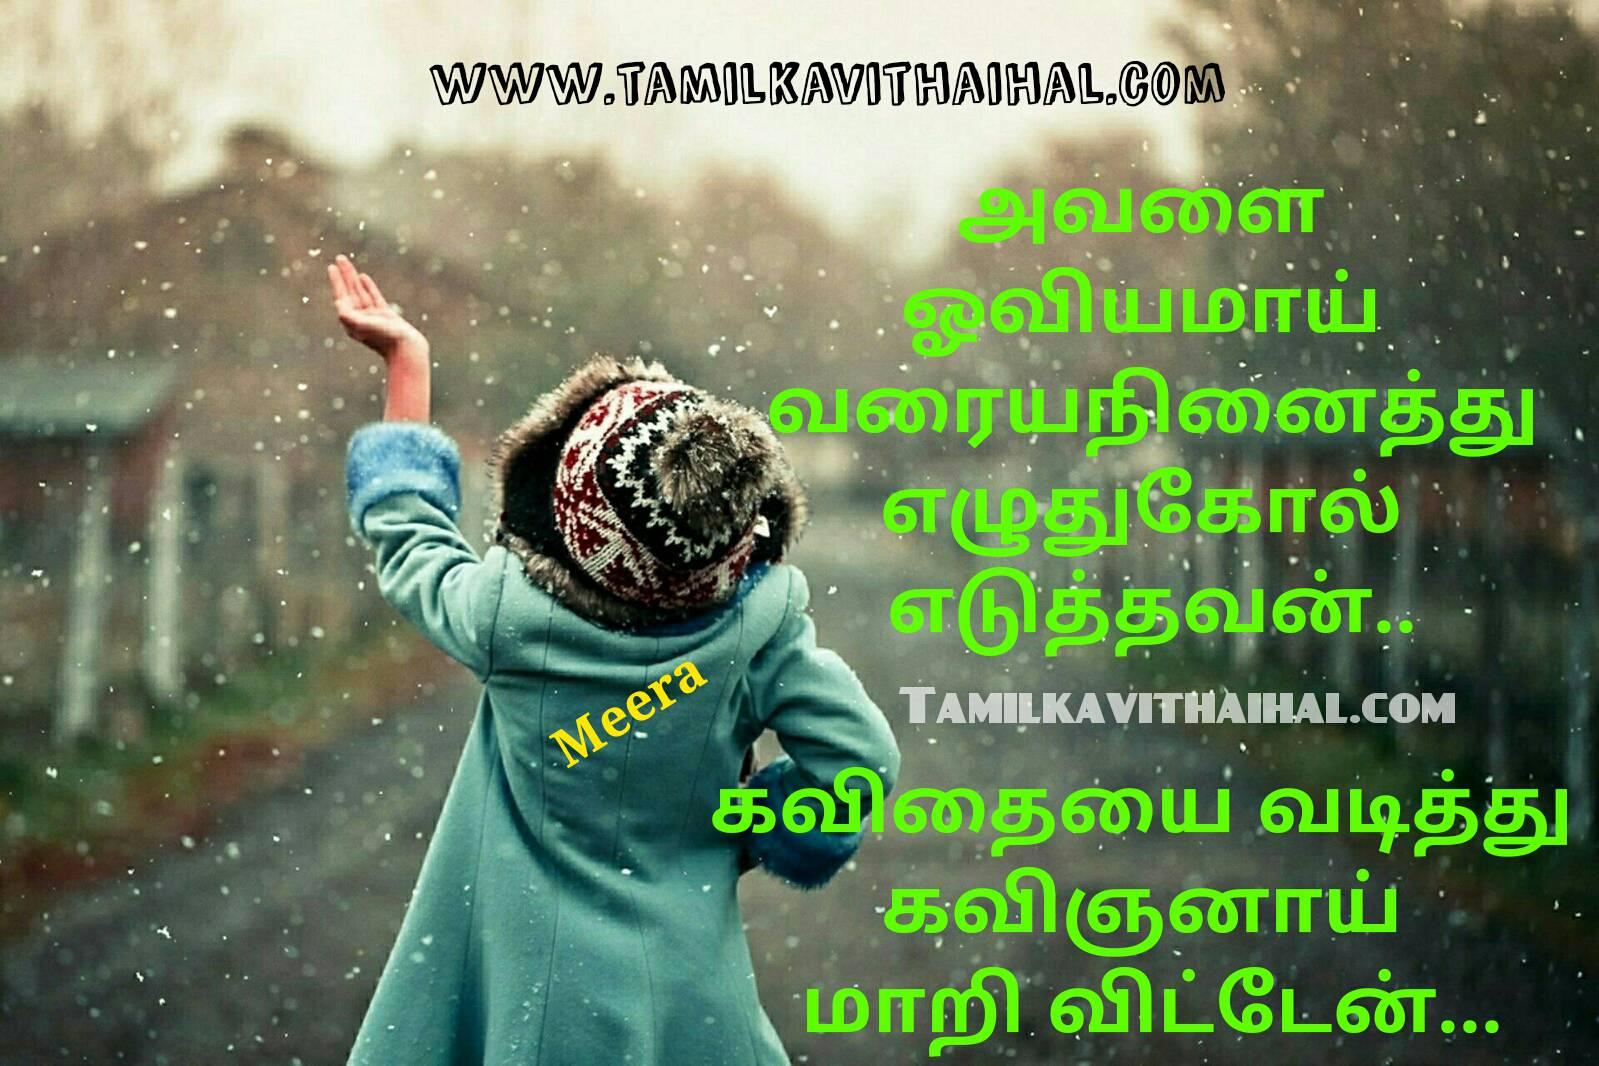 Awesome tamil quotes oviyam varaiya ninaithu writing girl image painting kavithai penmai meera poem wallpaper